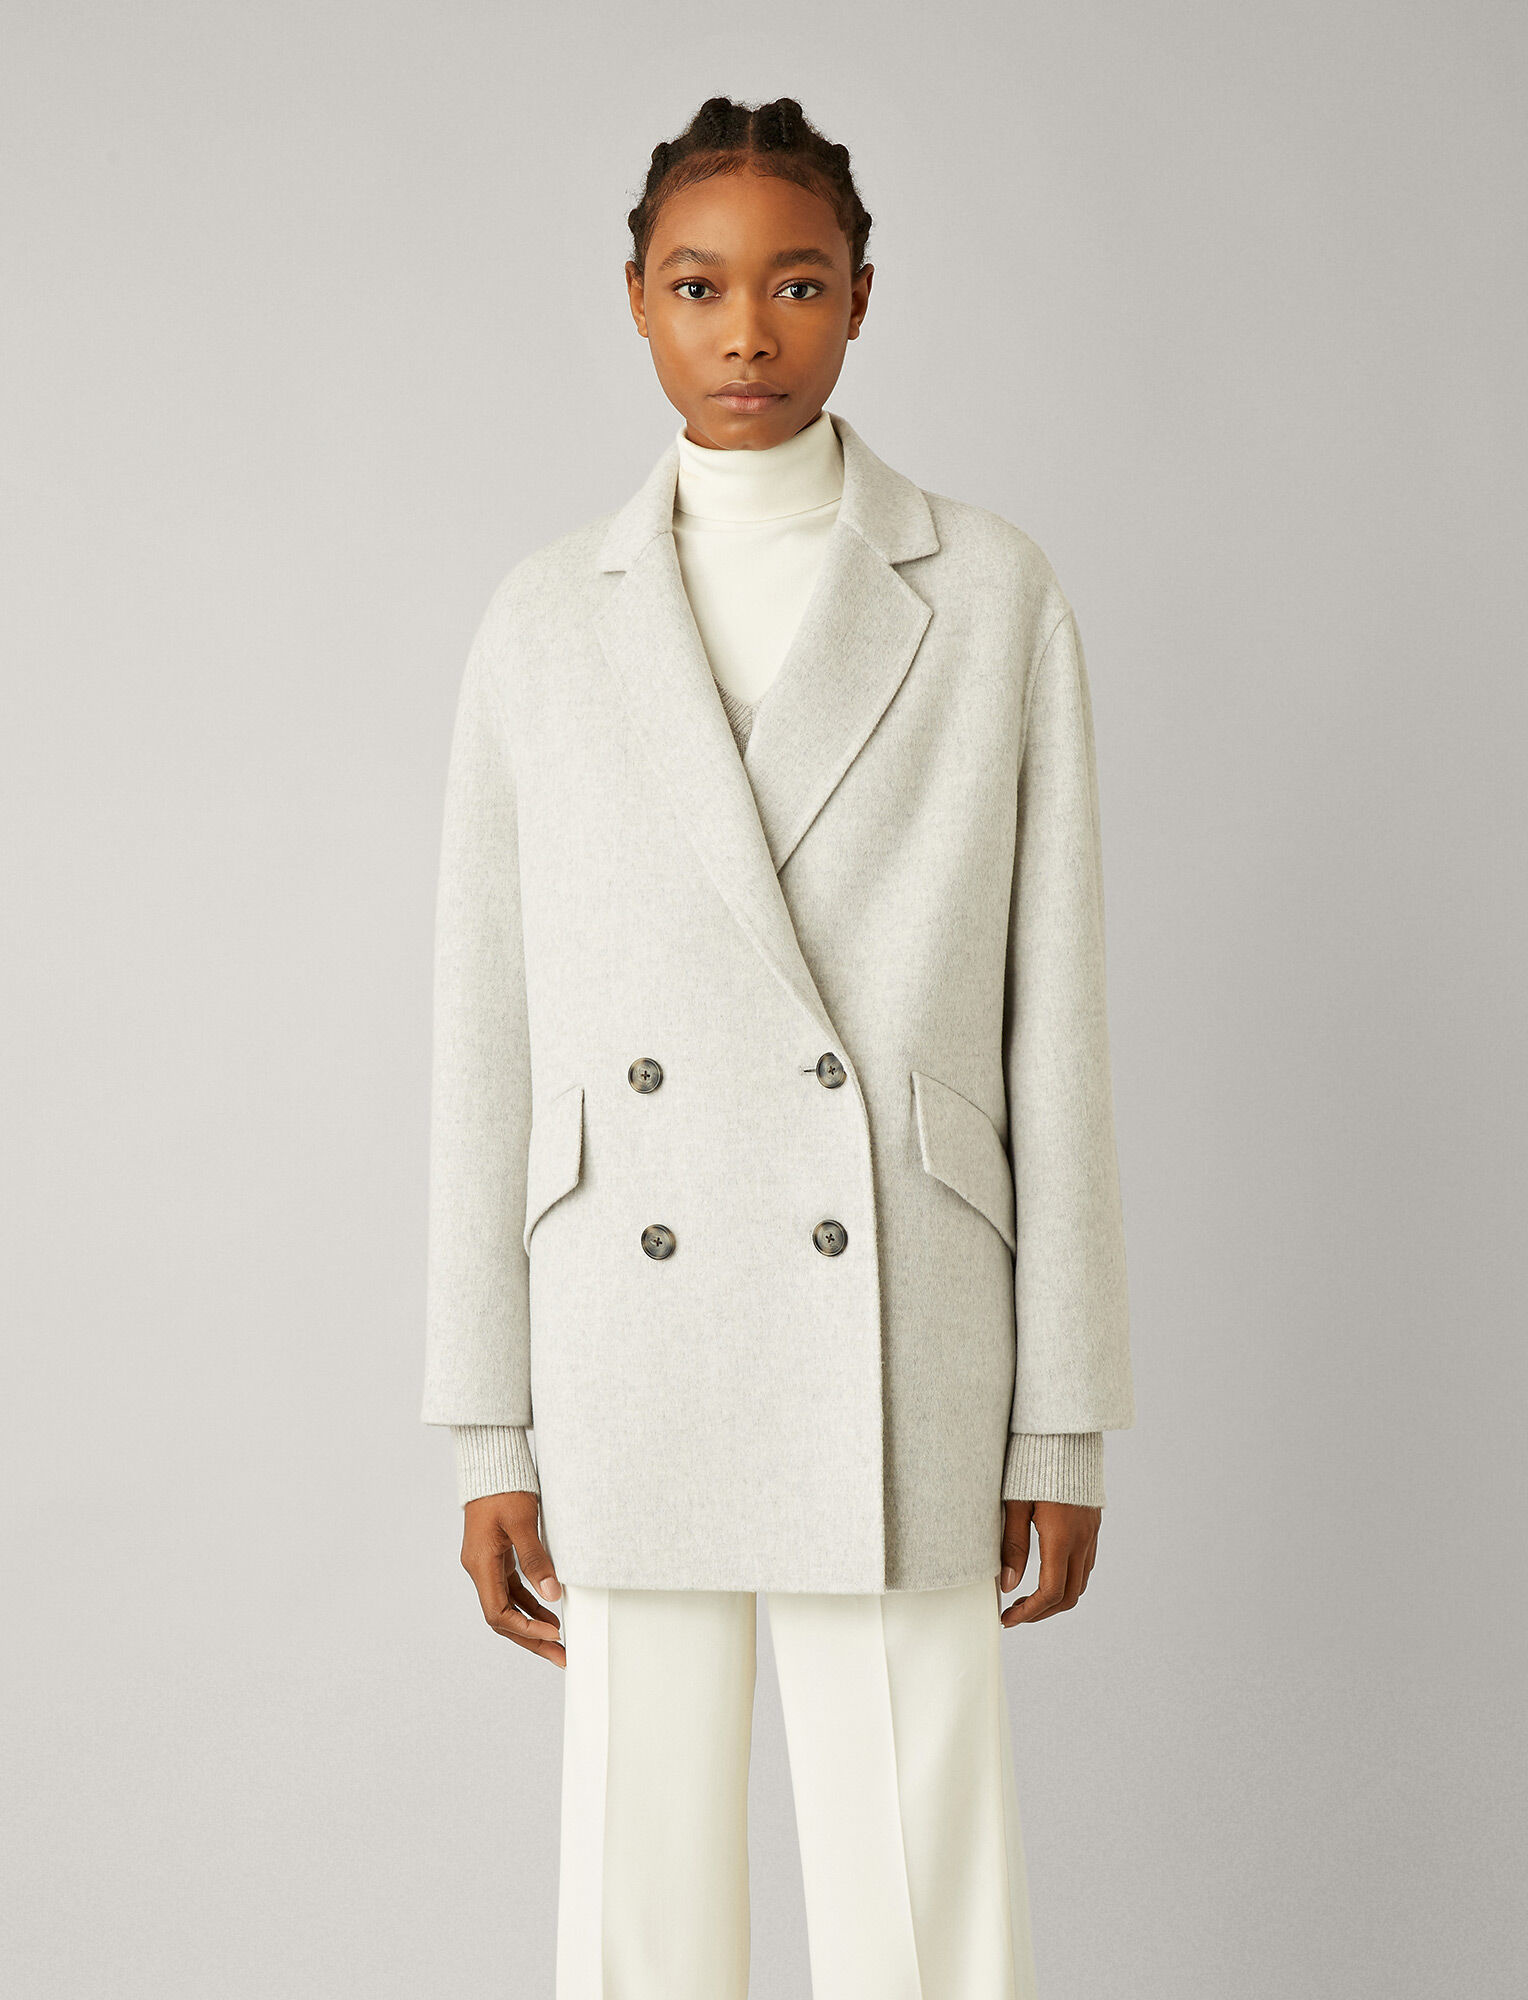 Milburn Pearl coat cashmere